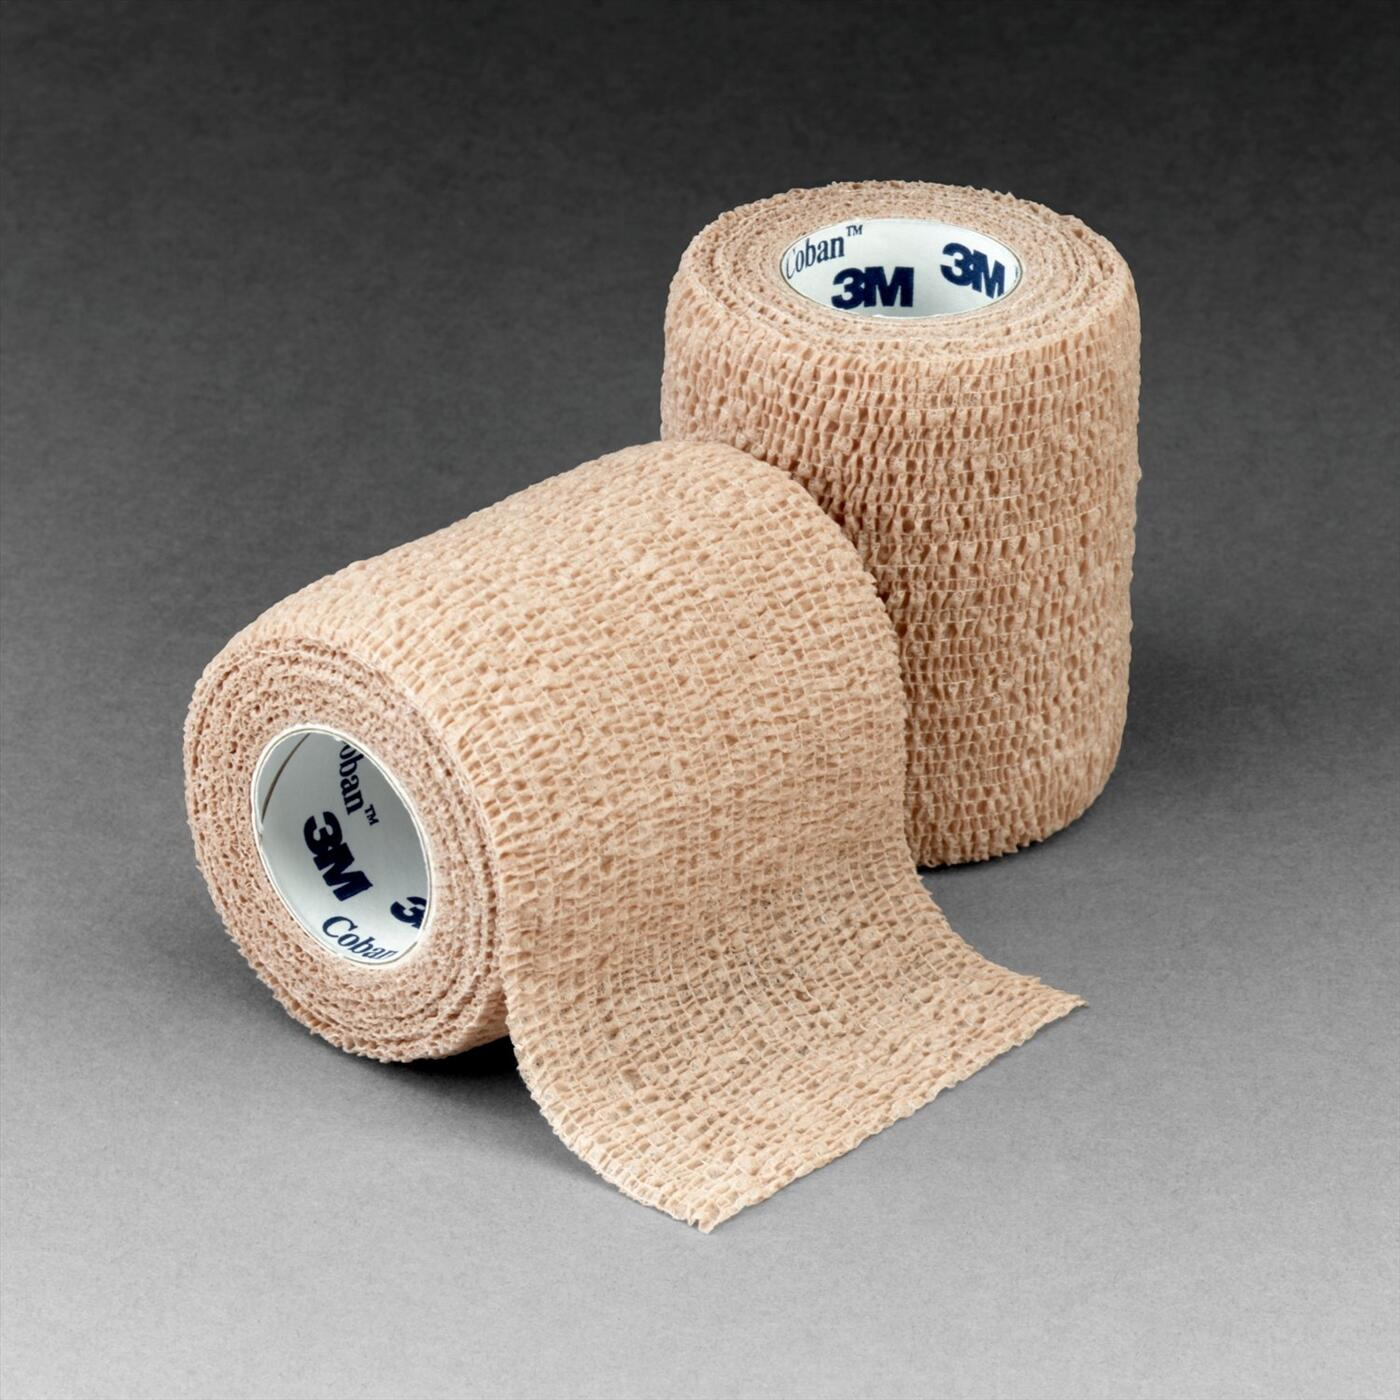 Băng thun tự dính 3M Coban Self Adherent Wrap 1583